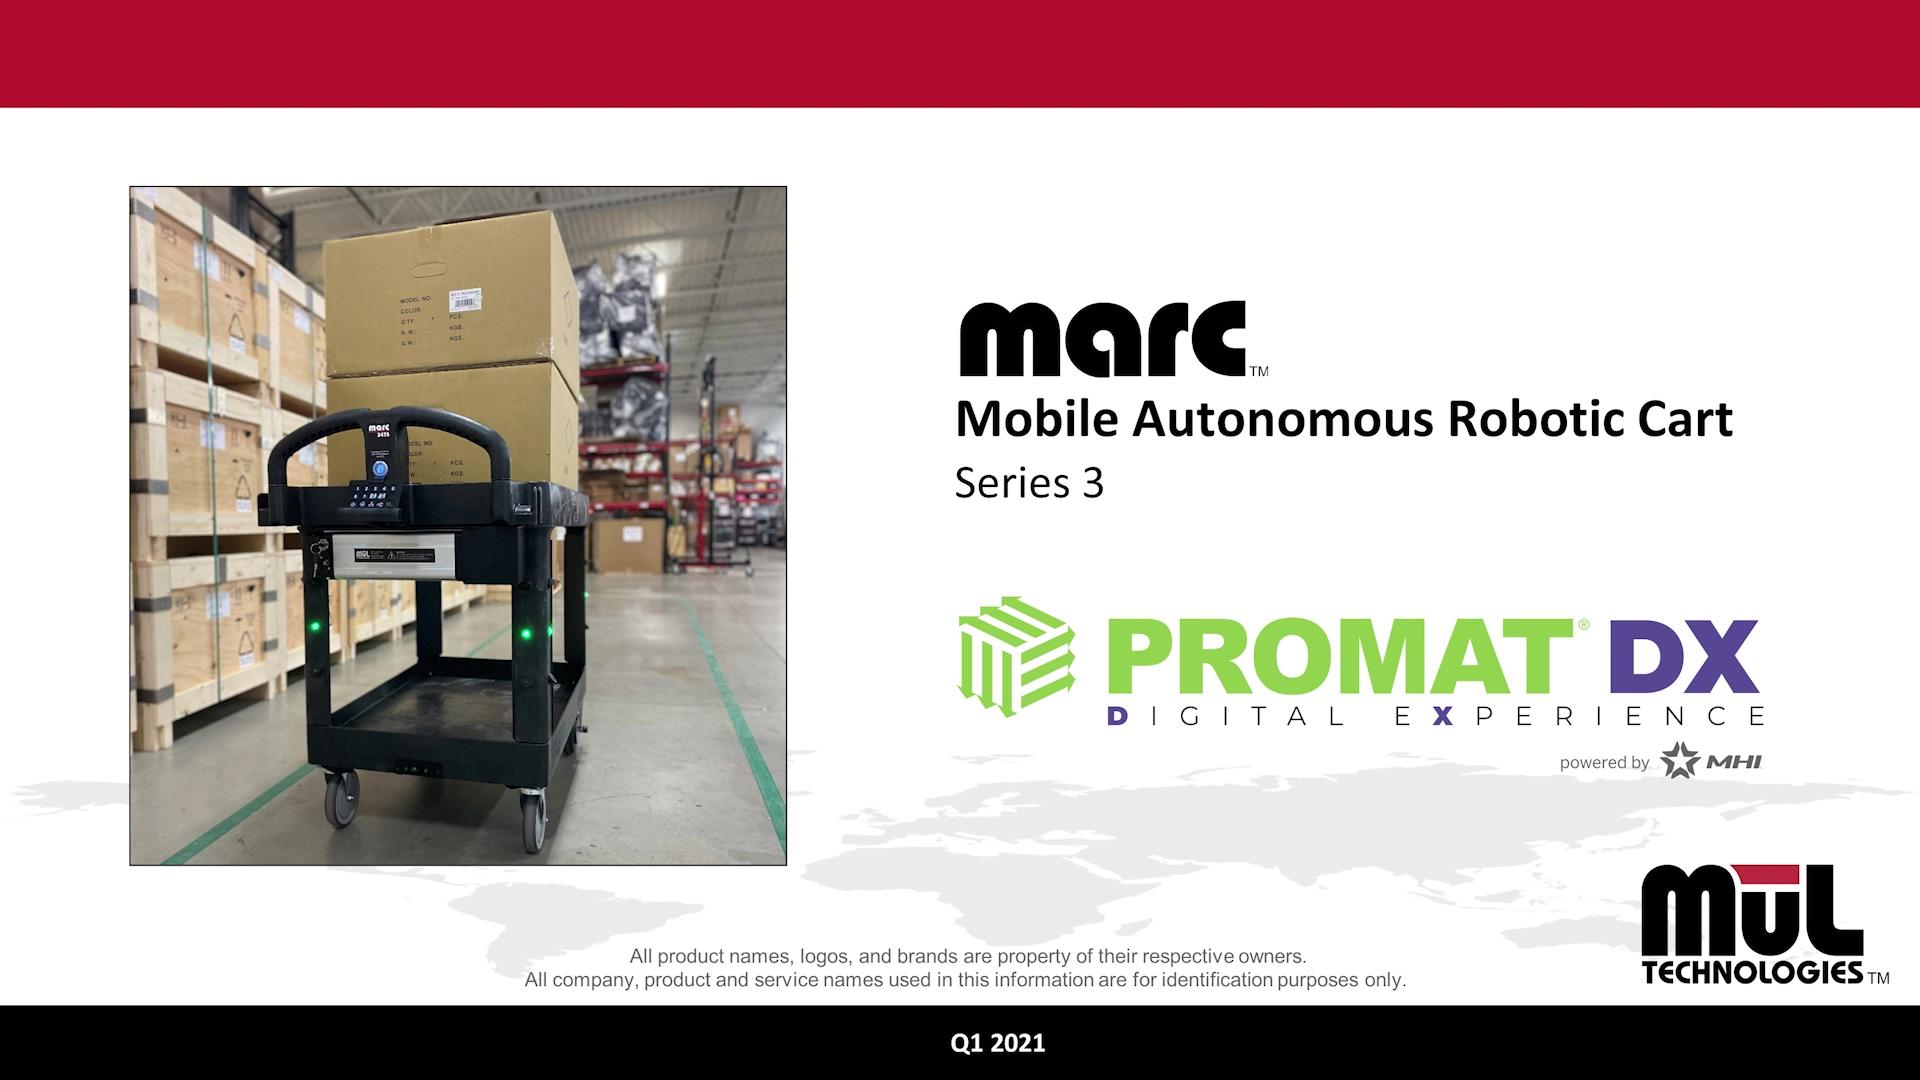 Promat_MuL_Technologies_MARC_demo